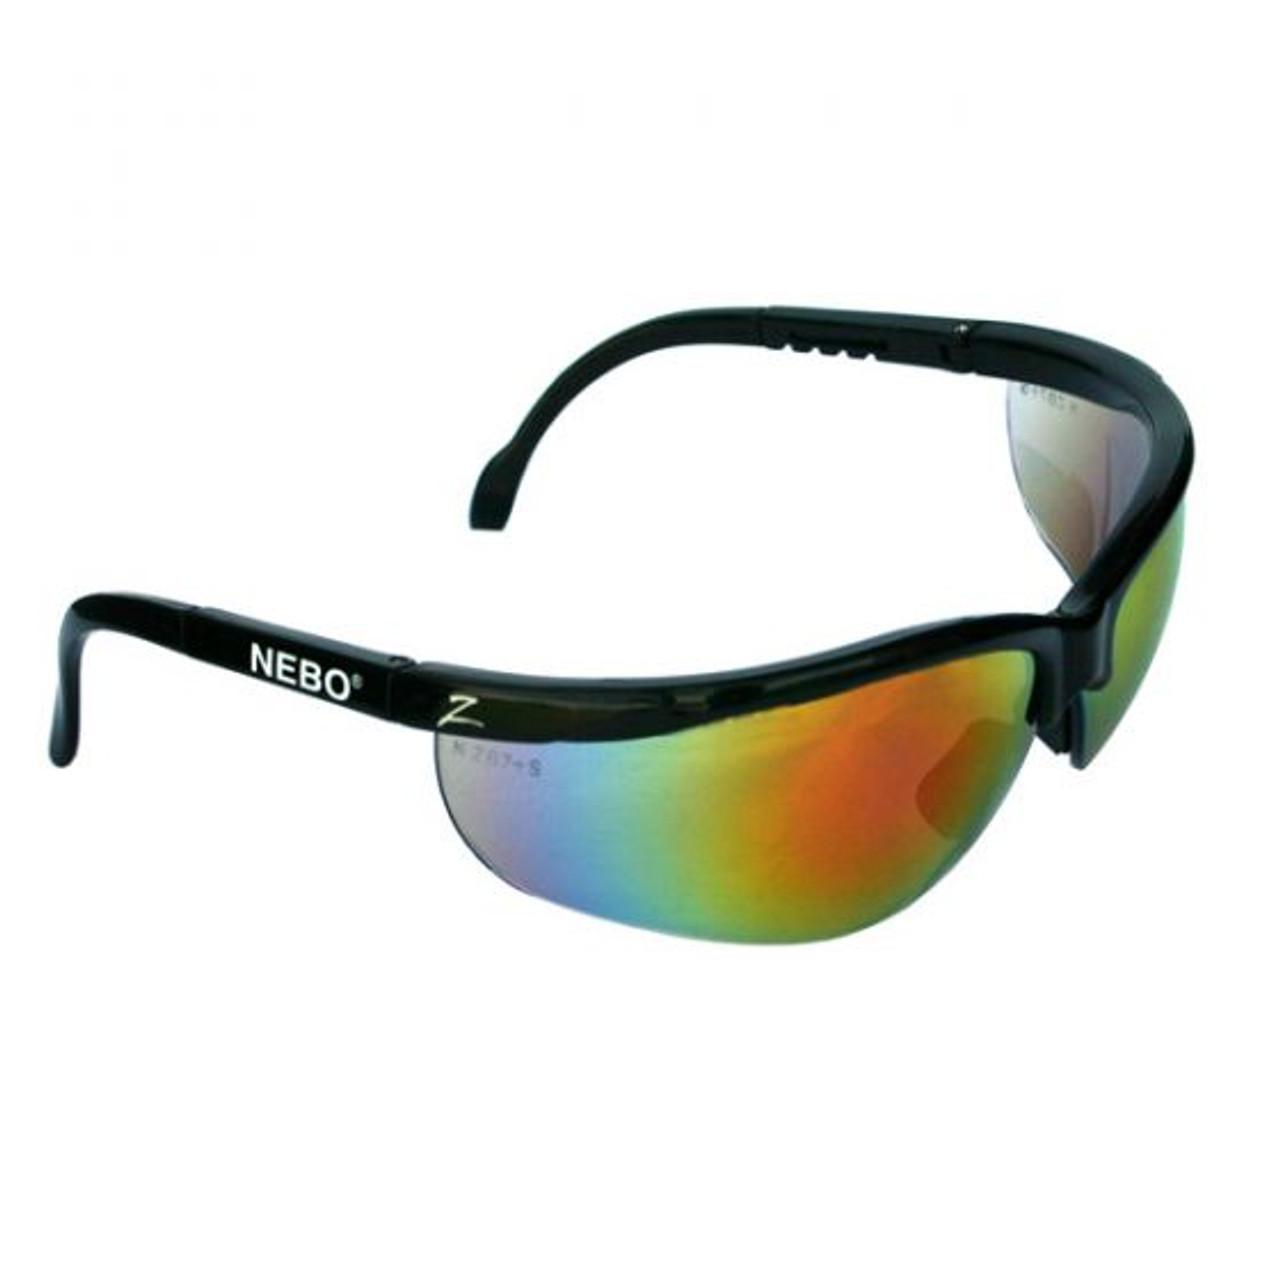 Nebo Shooting Glasses